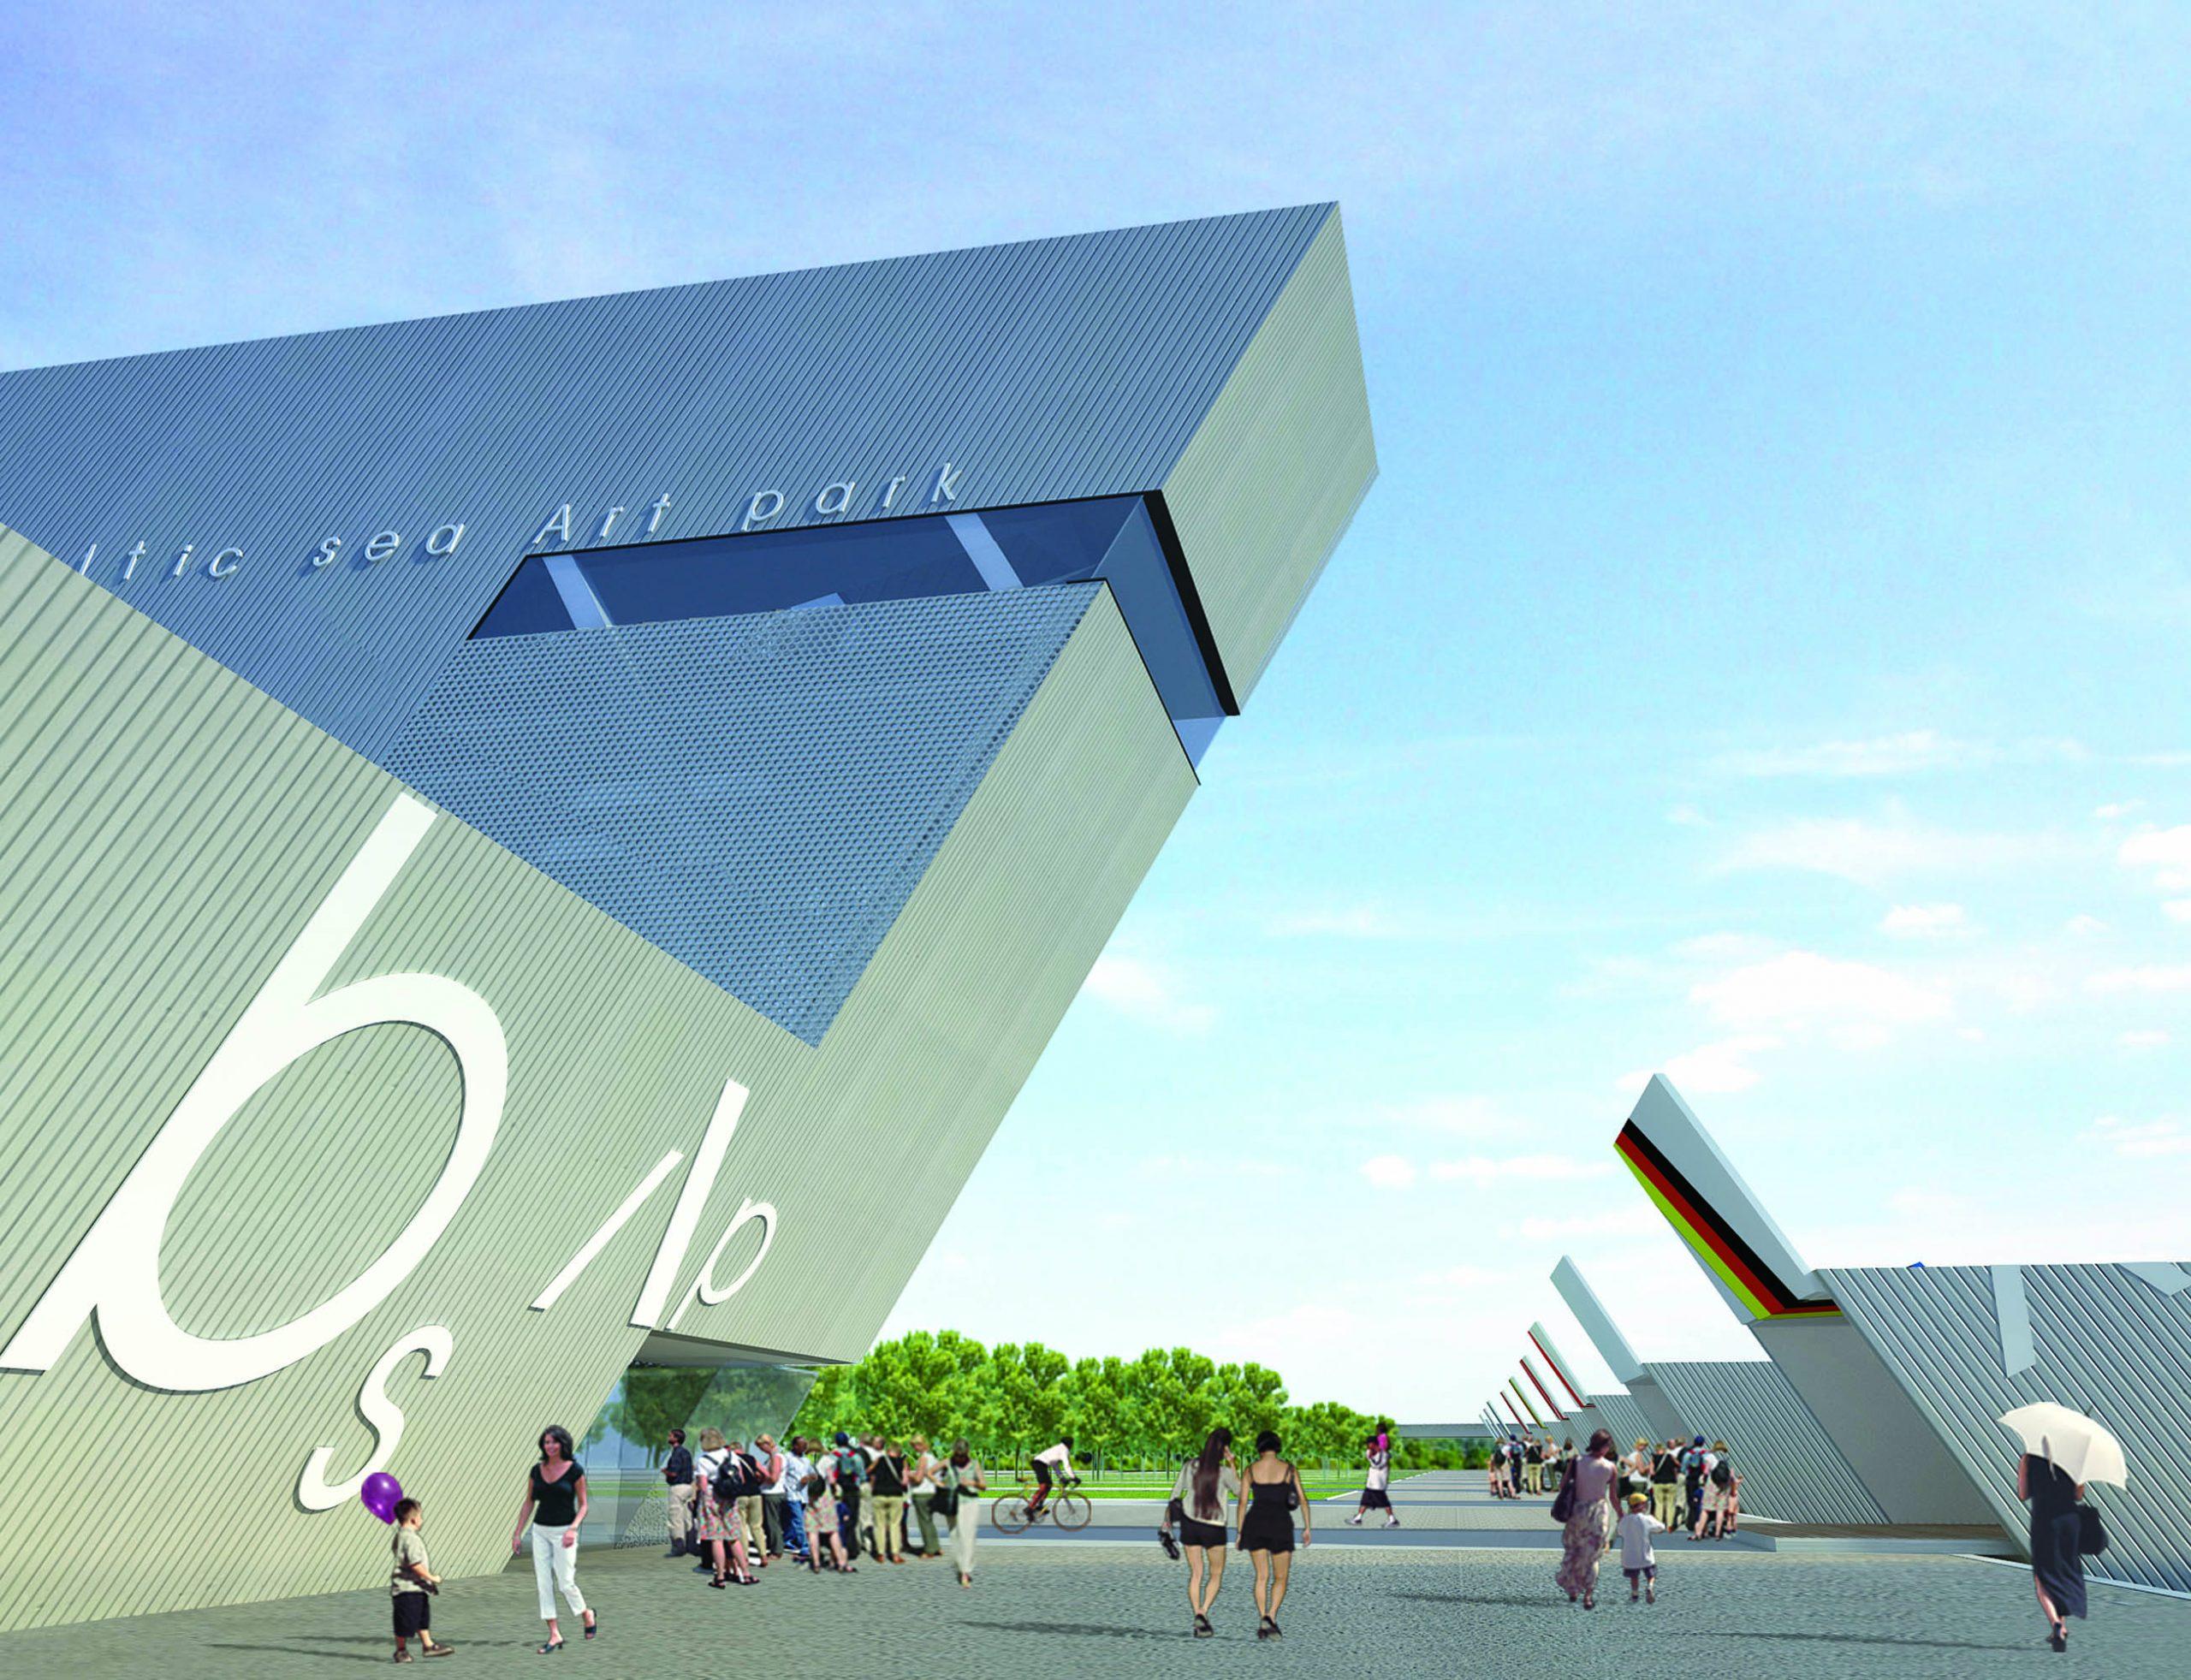 https://nbc-arhitect.ro/wp-content/uploads/2020/10/NBC-Arhitect-_-contests-_-Baltic-Sea-Art-International-Competition-_-Romania_4-scaled.jpg